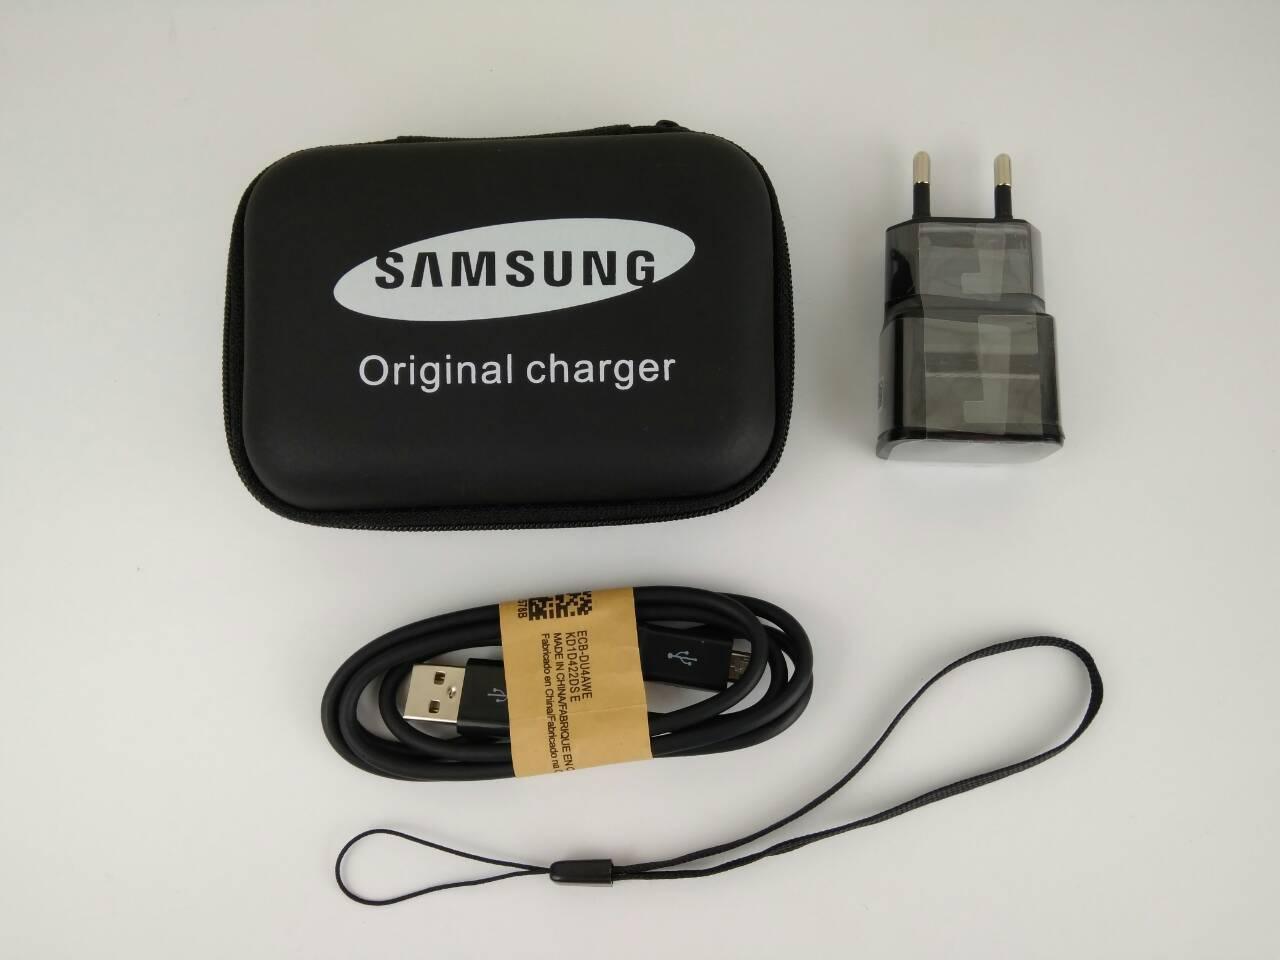 Сетевое зарядное устройство Samsung case 1USB/2.4A/Micro black (реплика)